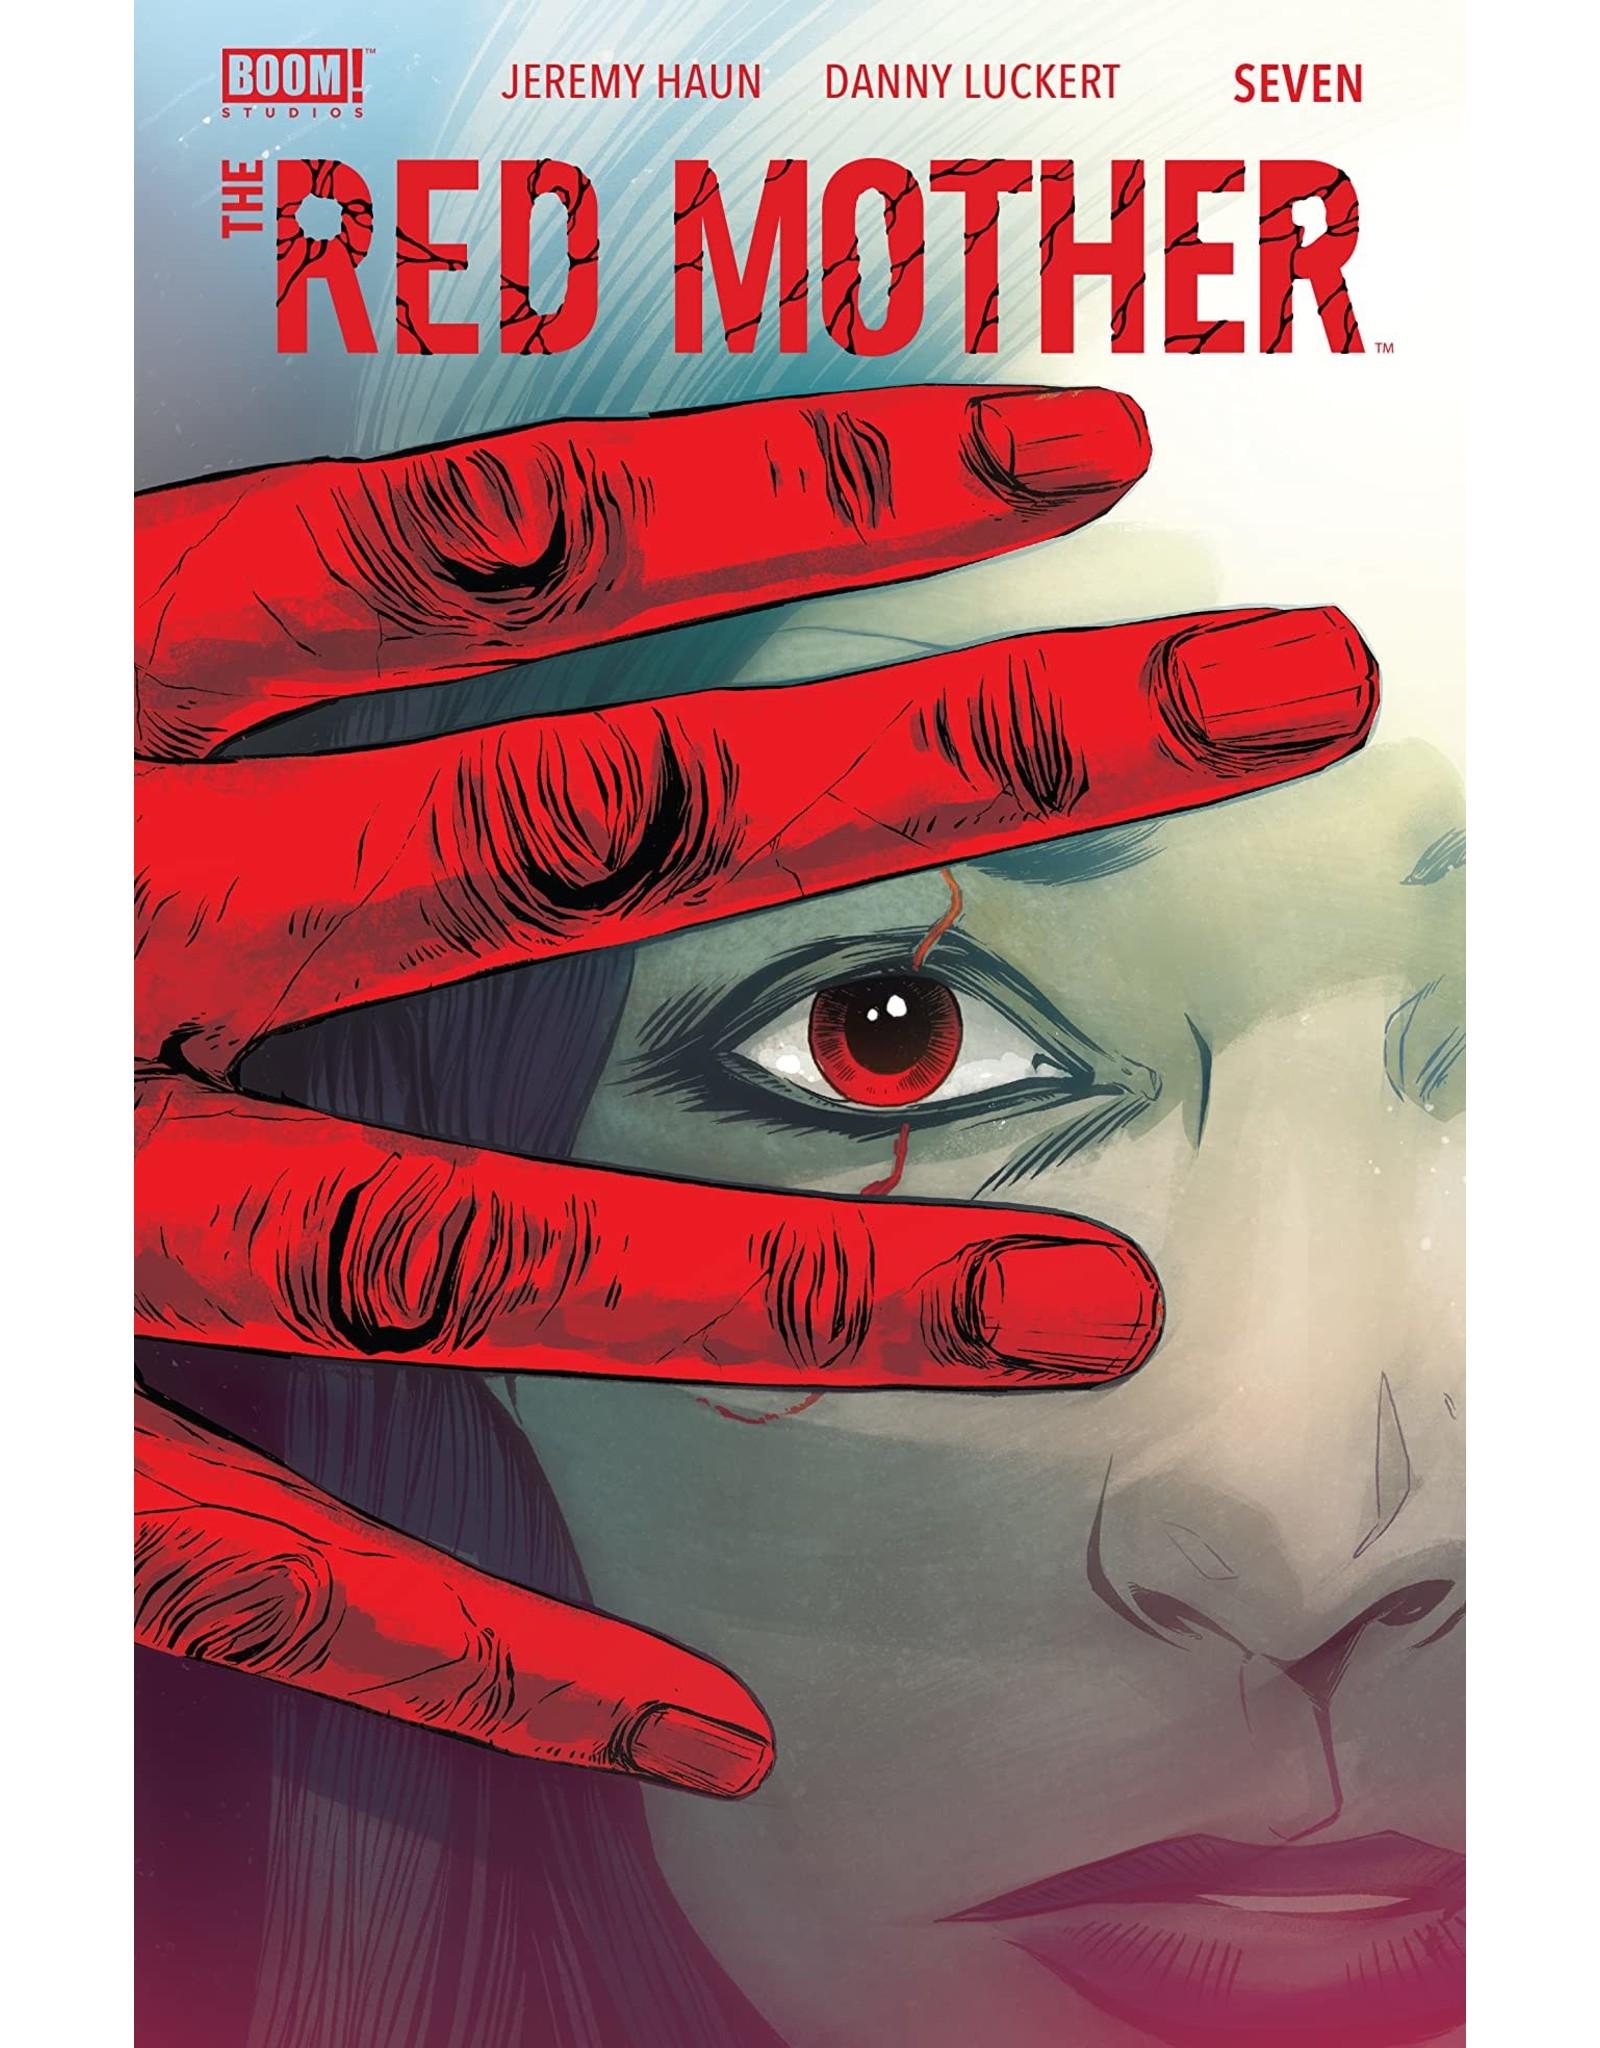 BOOM! STUDIOS RED MOTHER #7